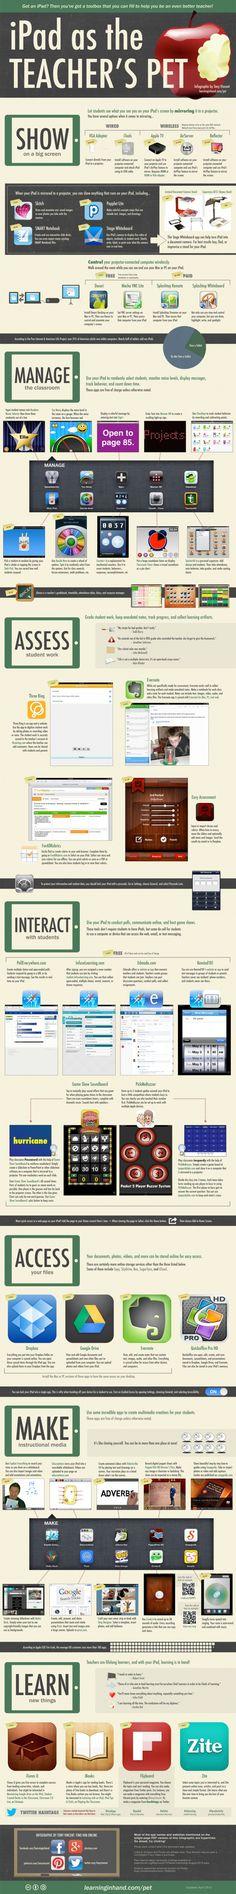 The iPad as the Teachers Pet Infographic. I KNEW I needed an IPAD!